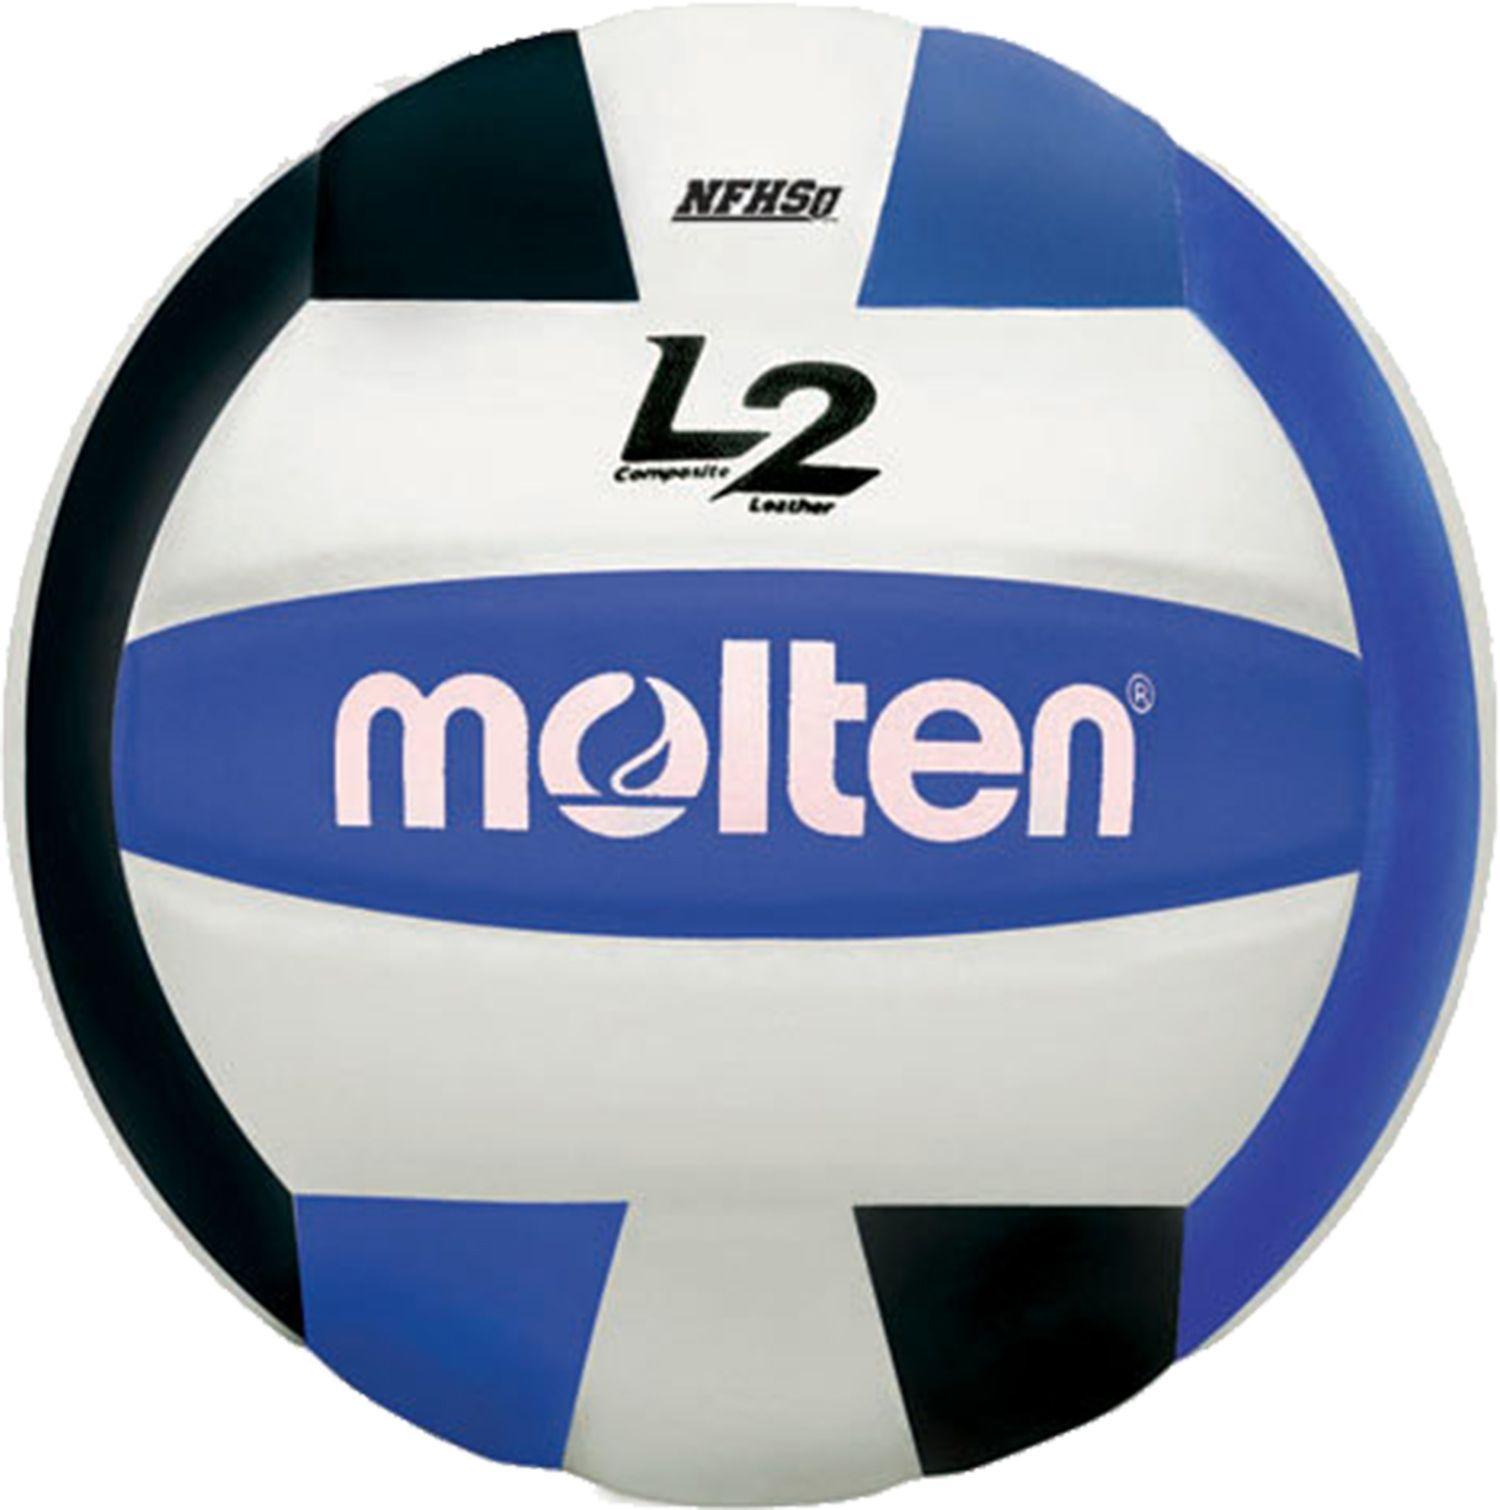 Molten L2 Replica Composite Indoor Volleyball Volleyball Molten Volleyball Competition